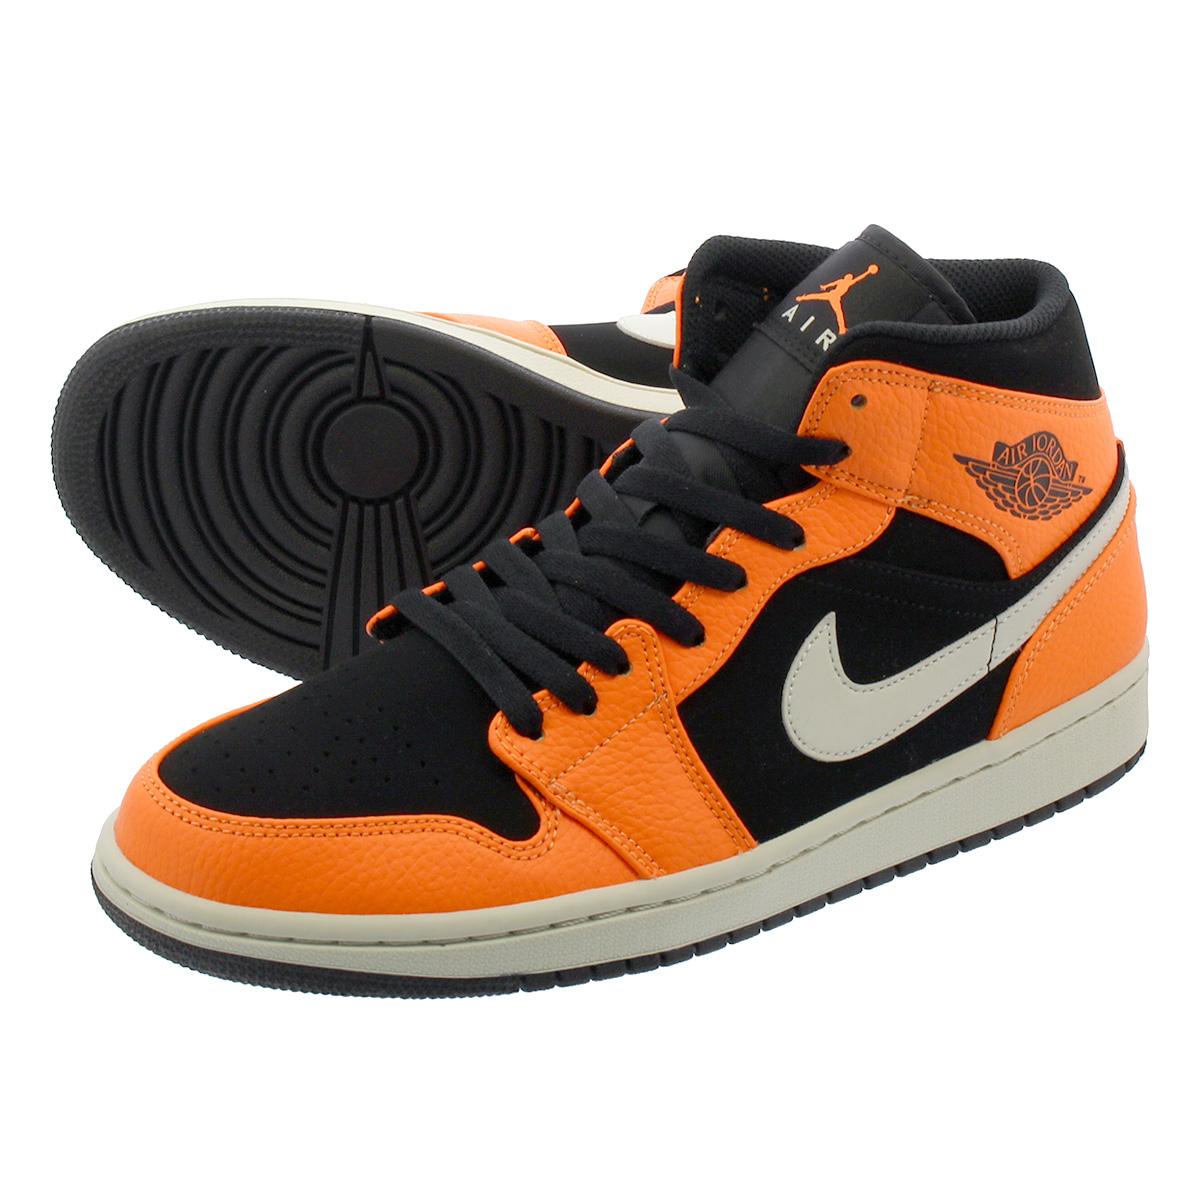 4769651cbd6b NIKE AIR JORDAN 1 MID Nike Air Jordan 1 mid BLACK CONE LIGHT BONE ORANGE  554